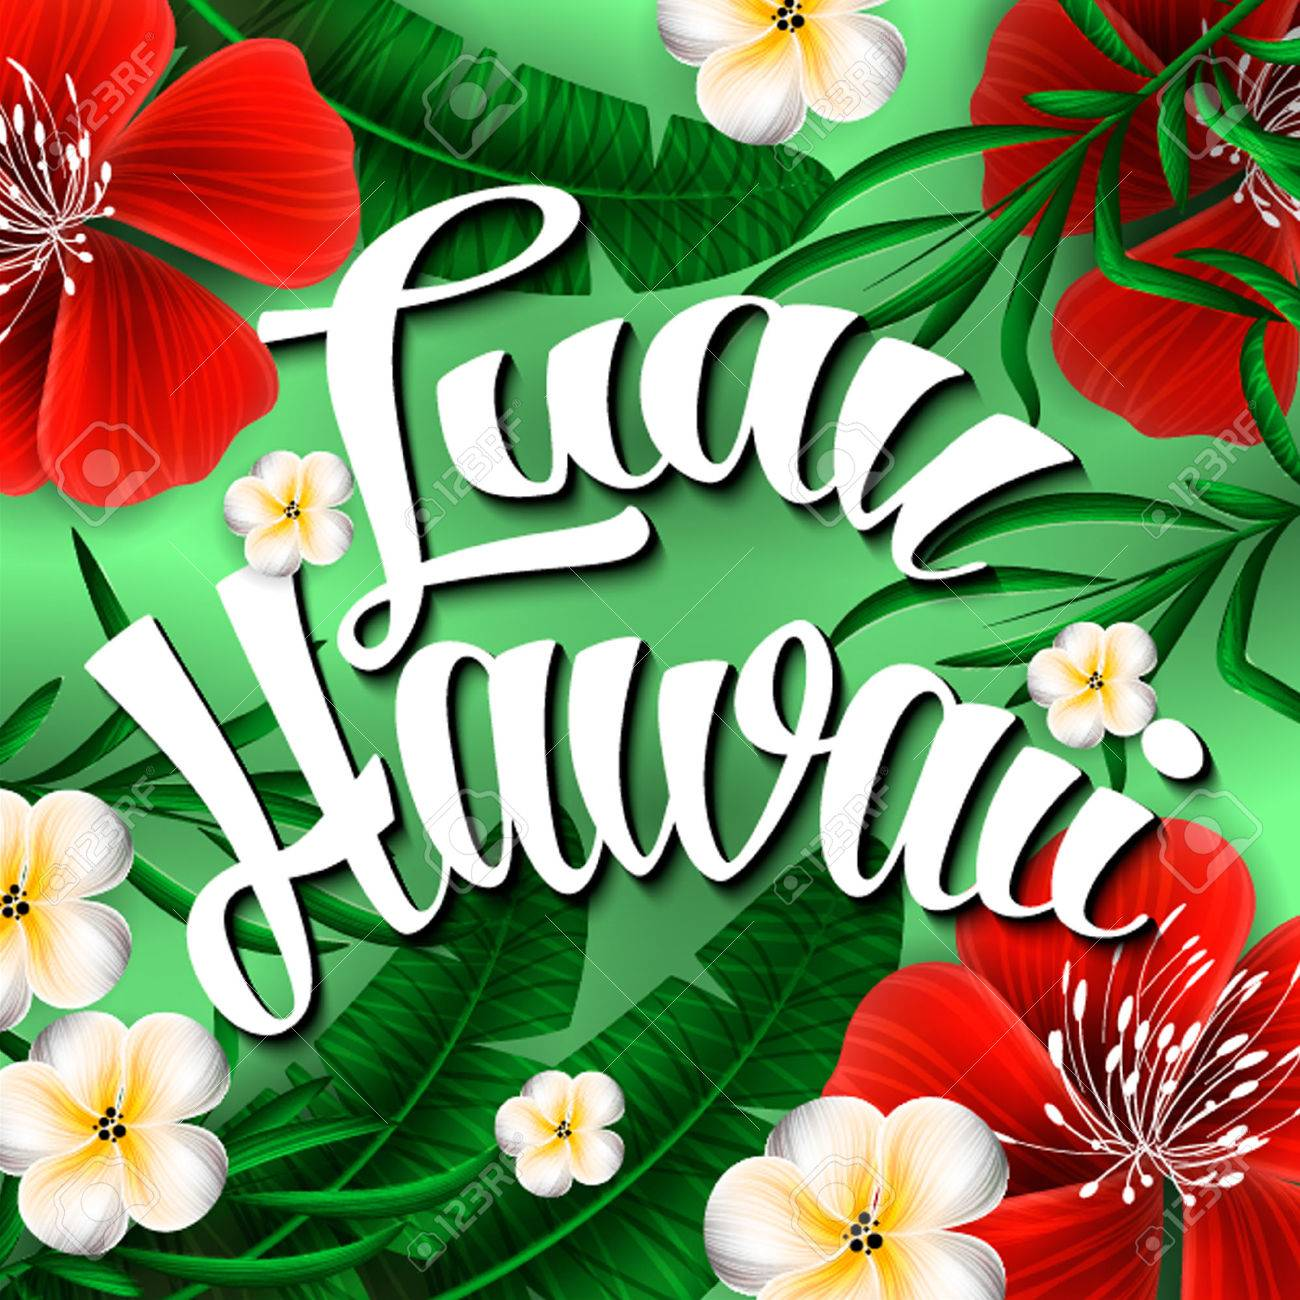 Luau hawaii invitation hand lettering exotic with tropical flowers luau hawaii invitation hand lettering exotic with tropical flowers stock vector 57412103 stopboris Gallery